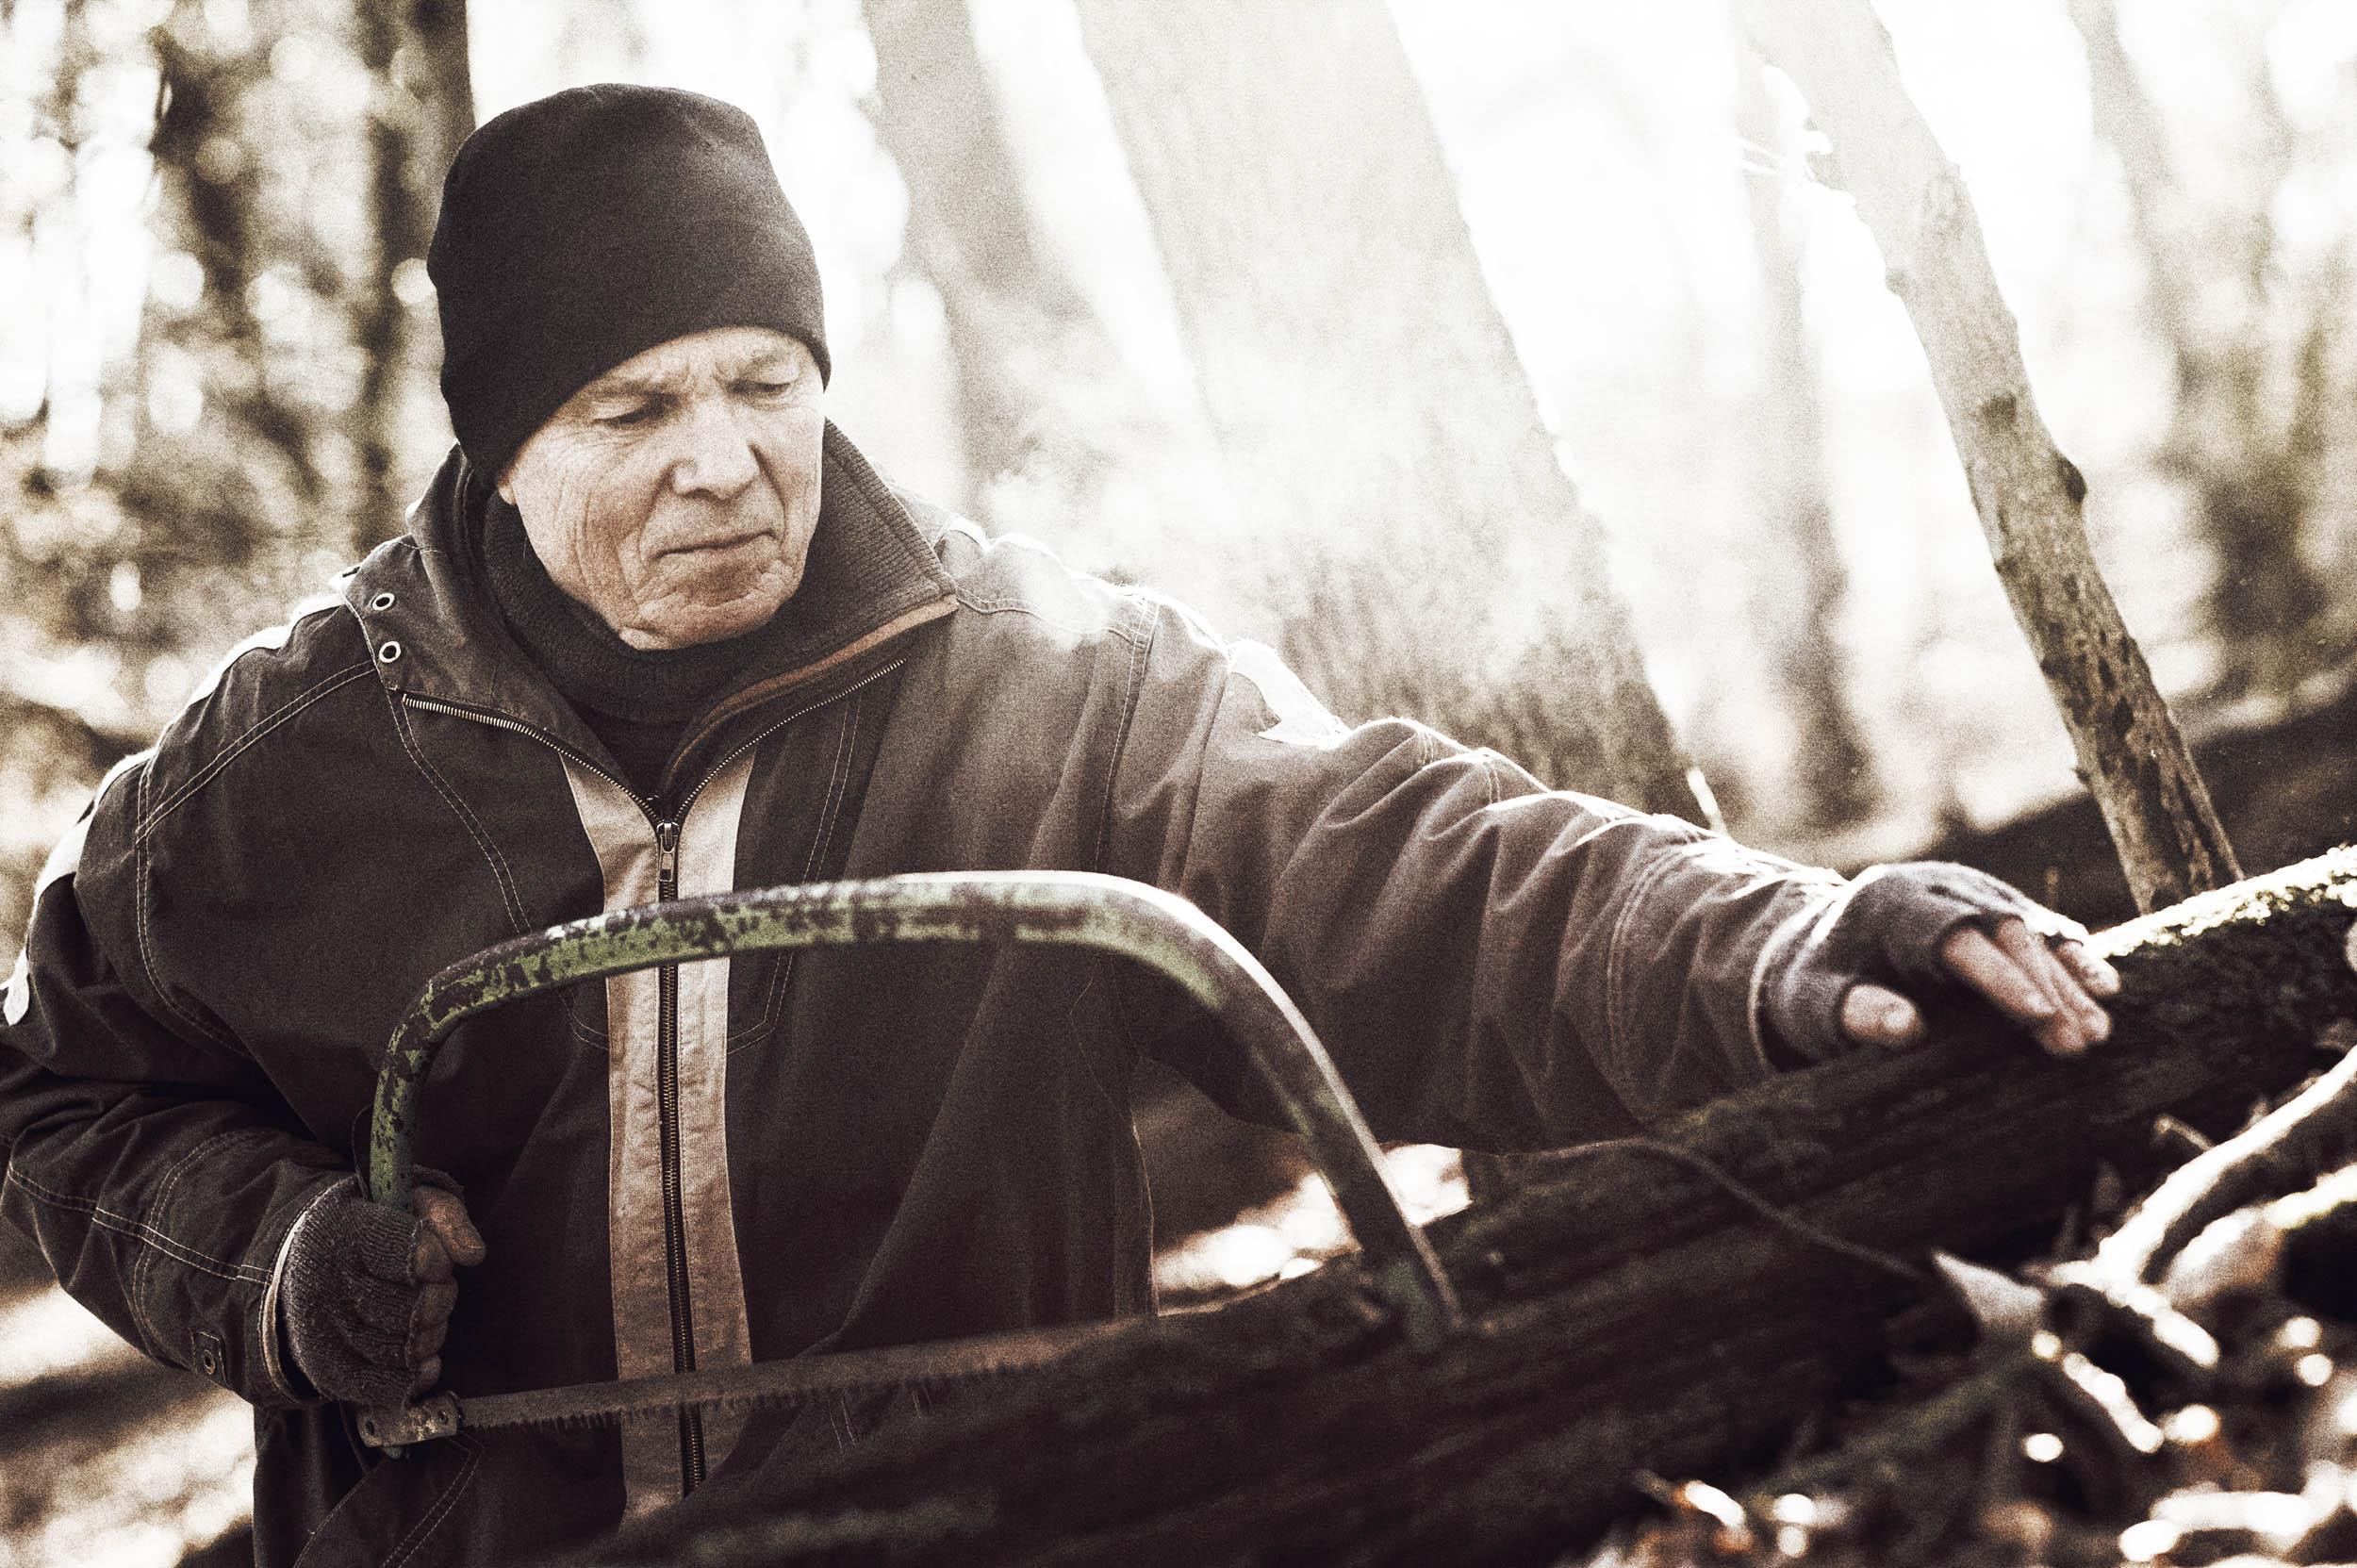 seifertuebler-corporate-handcraft-woodsculpture-vogel-01.jpg